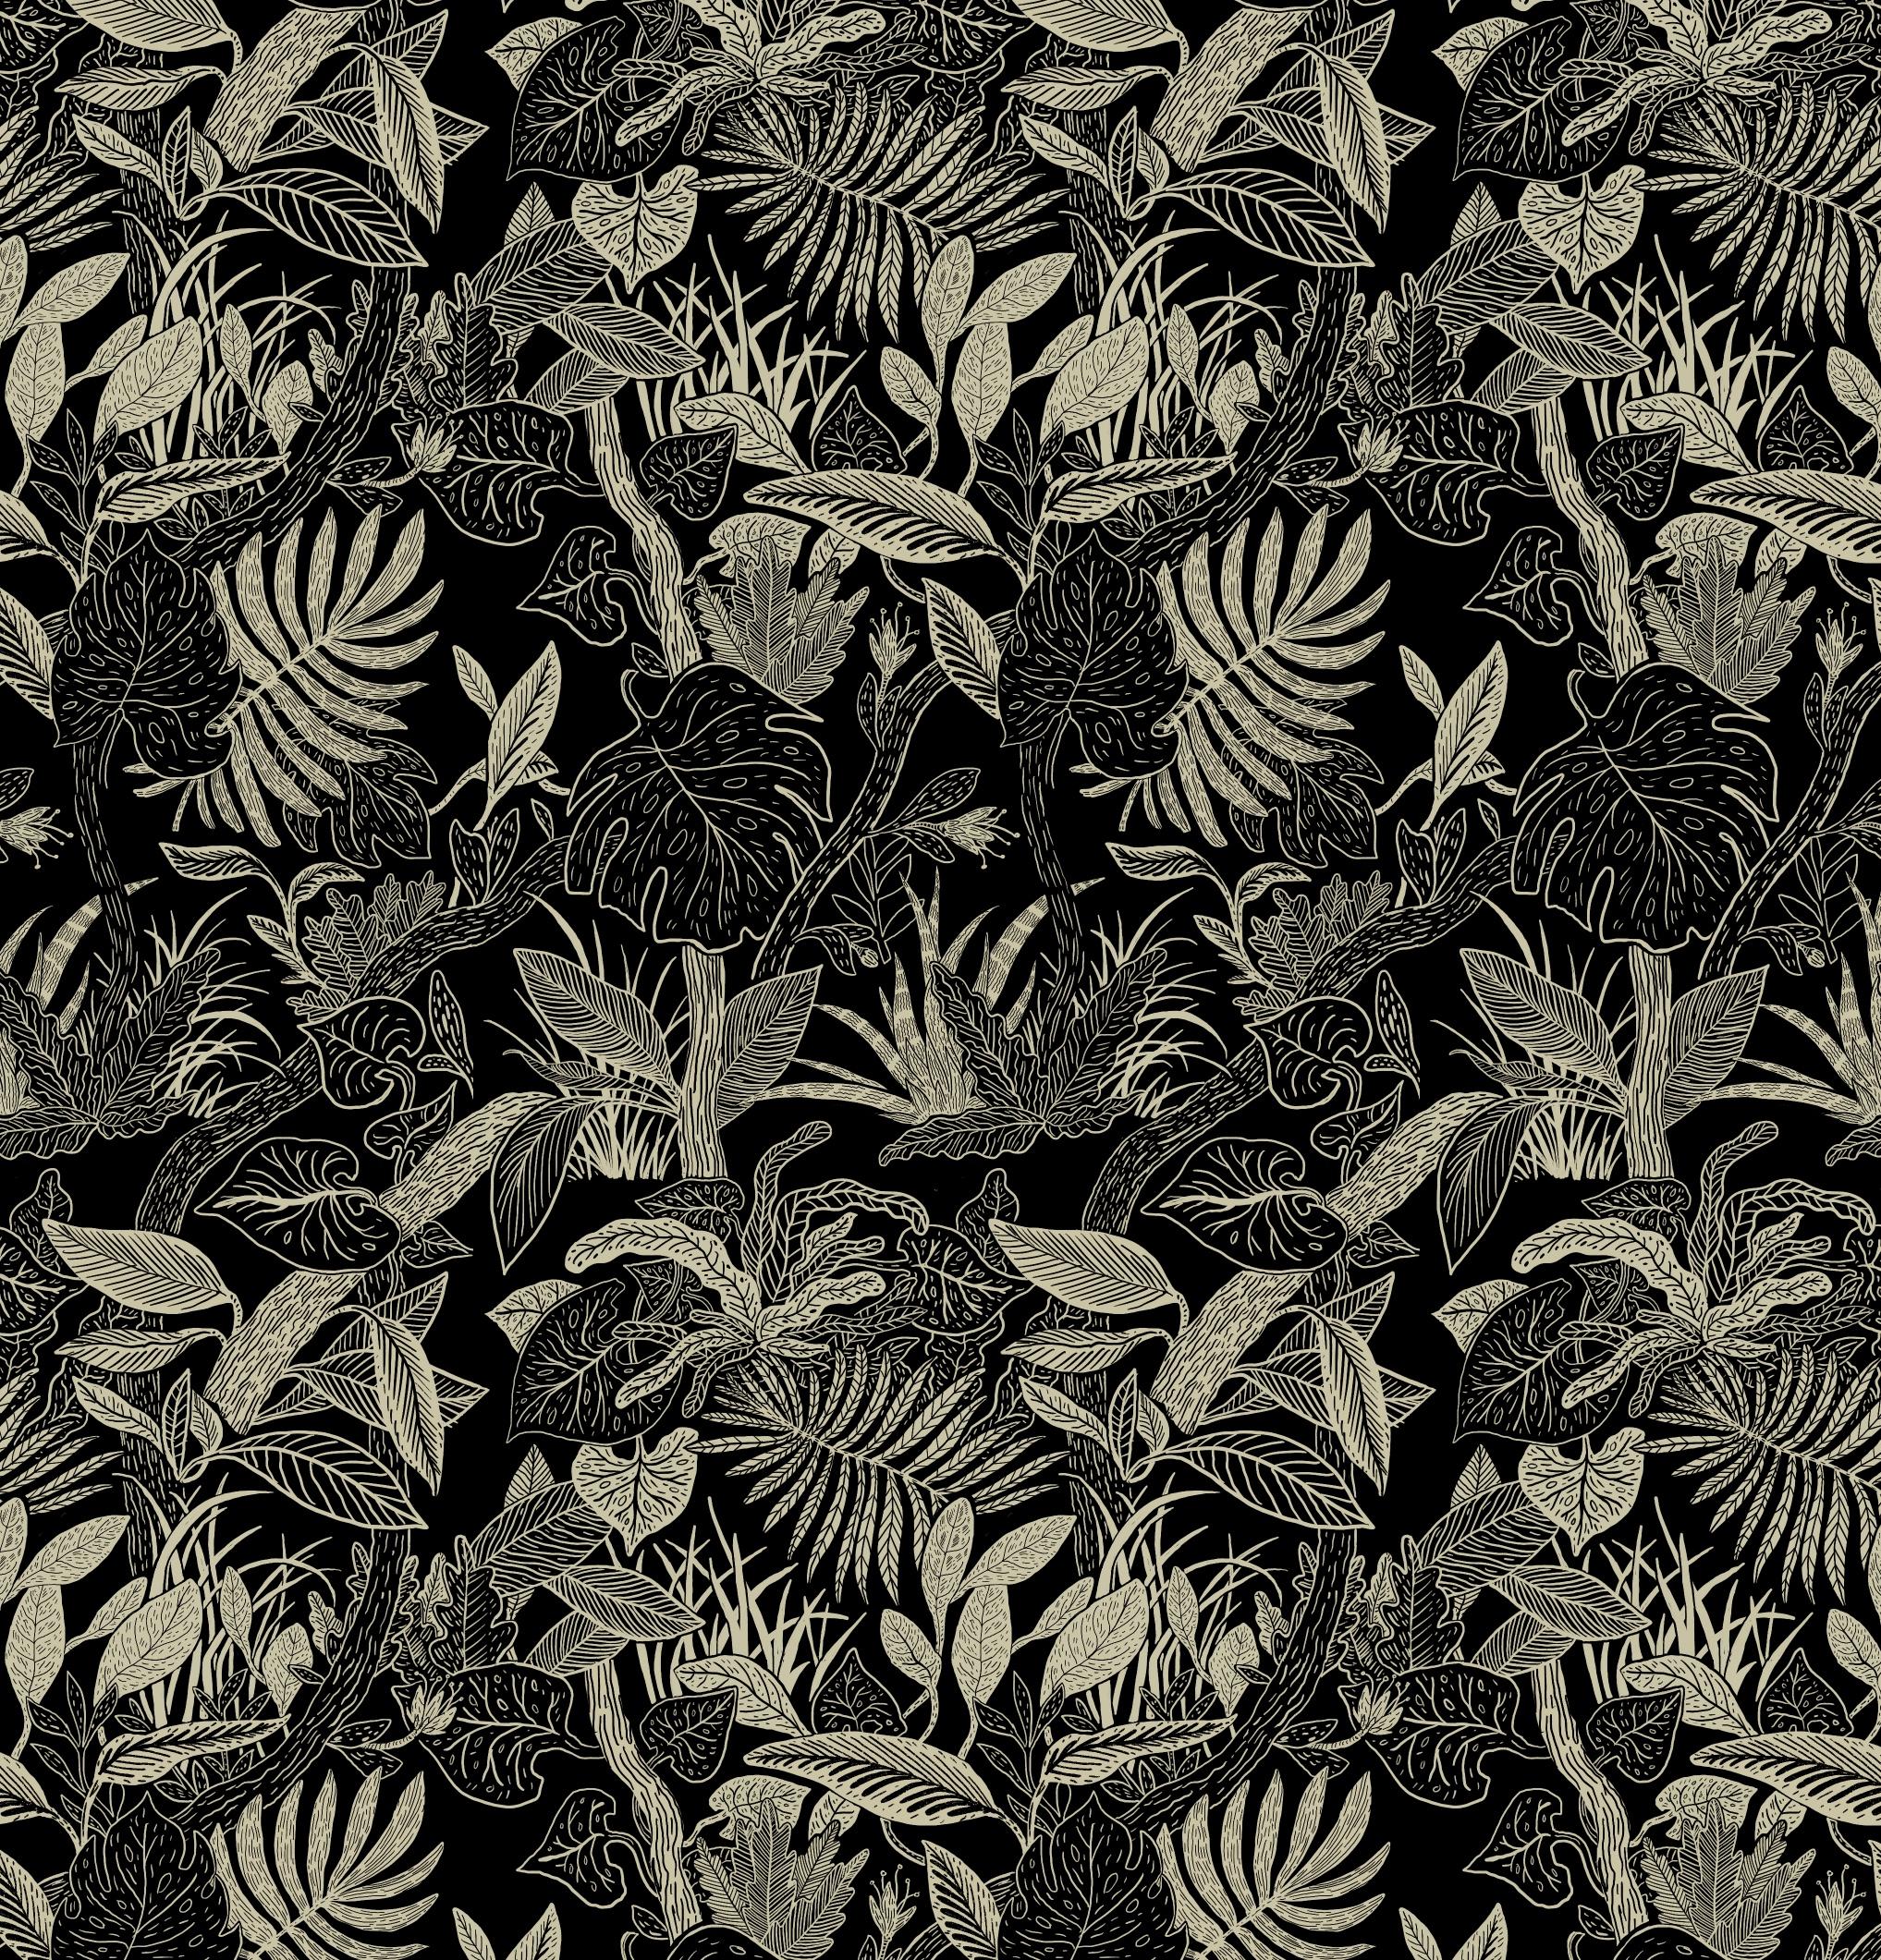 plant pattern 2.jpg